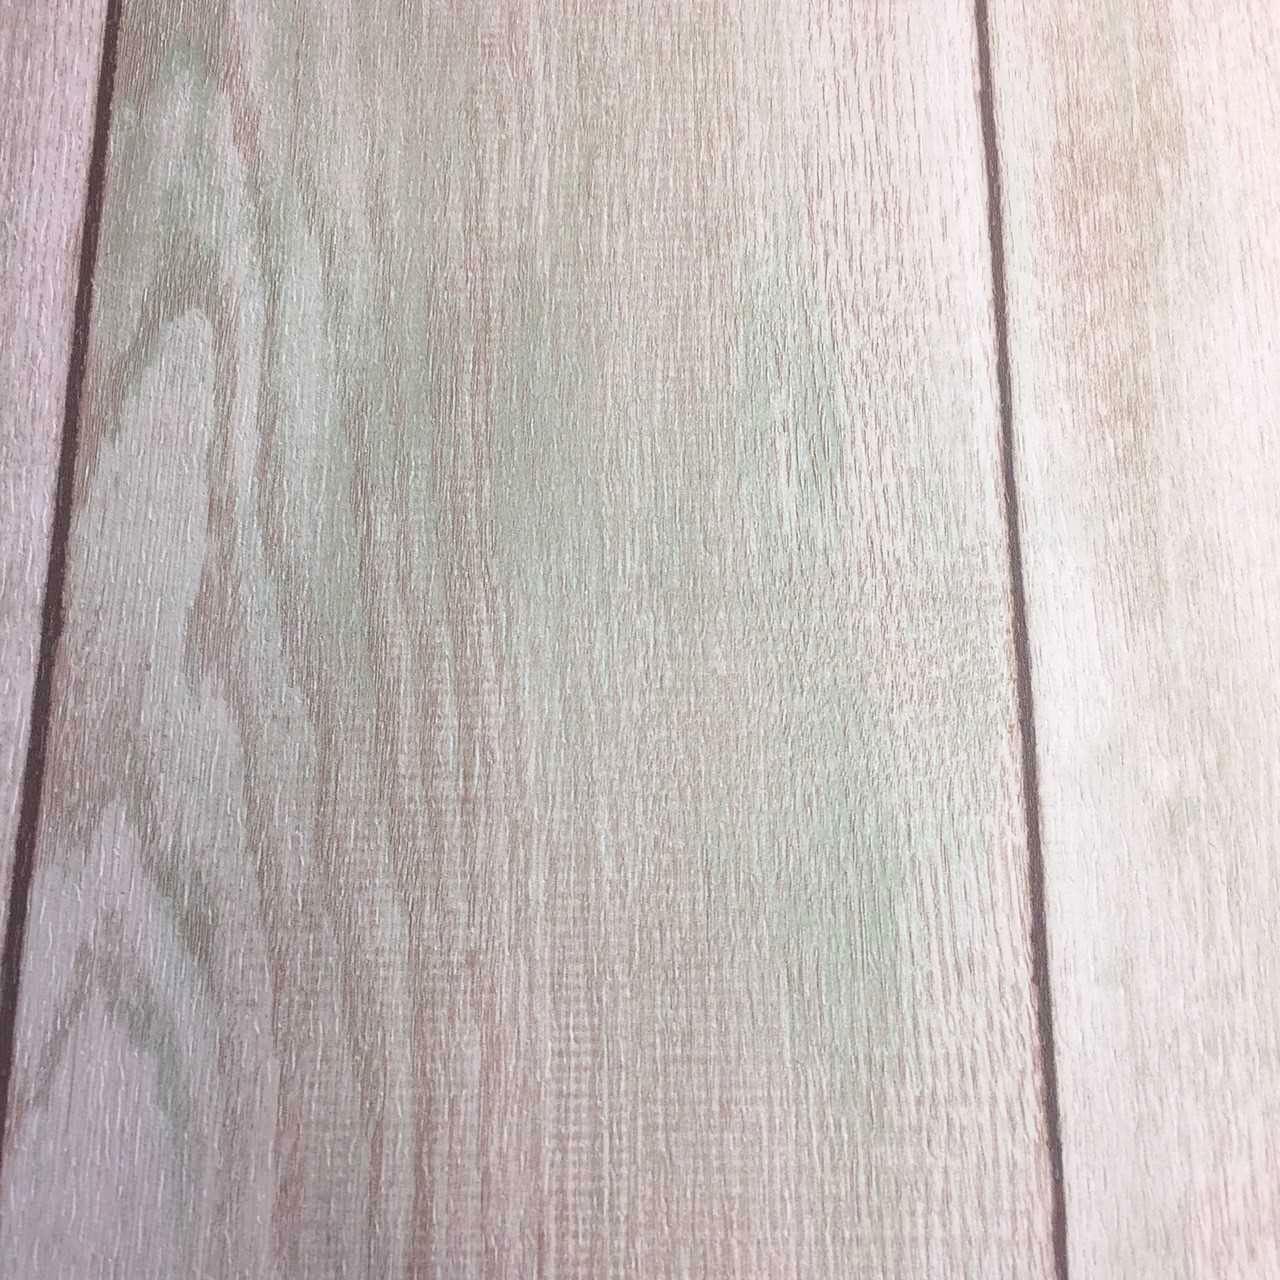 Wood-Effect-Wallpaper-Grains-Boards-Planks-Paste-The-Wall-Vinyl-Koziel-3-Colours thumbnail 7